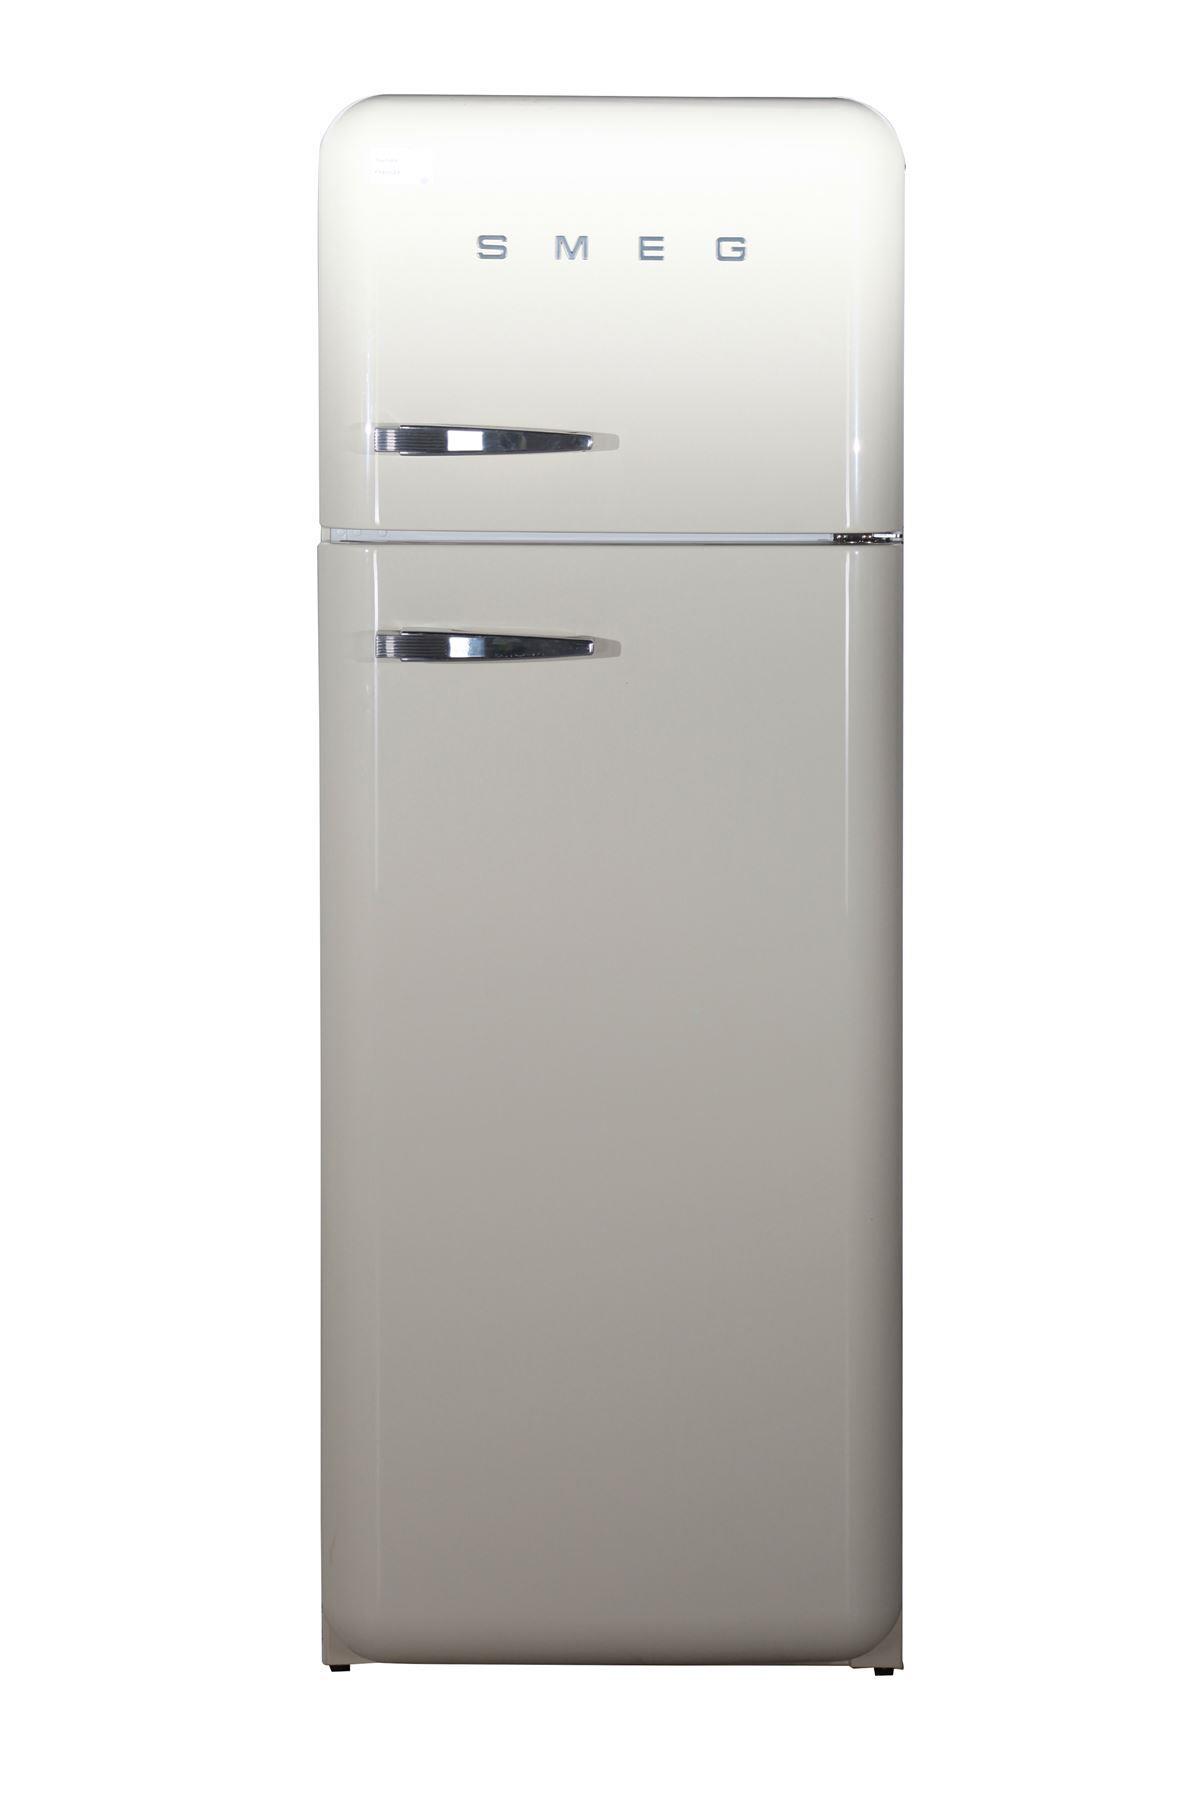 smeg fridge freezer fab30qp cream online store. Black Bedroom Furniture Sets. Home Design Ideas